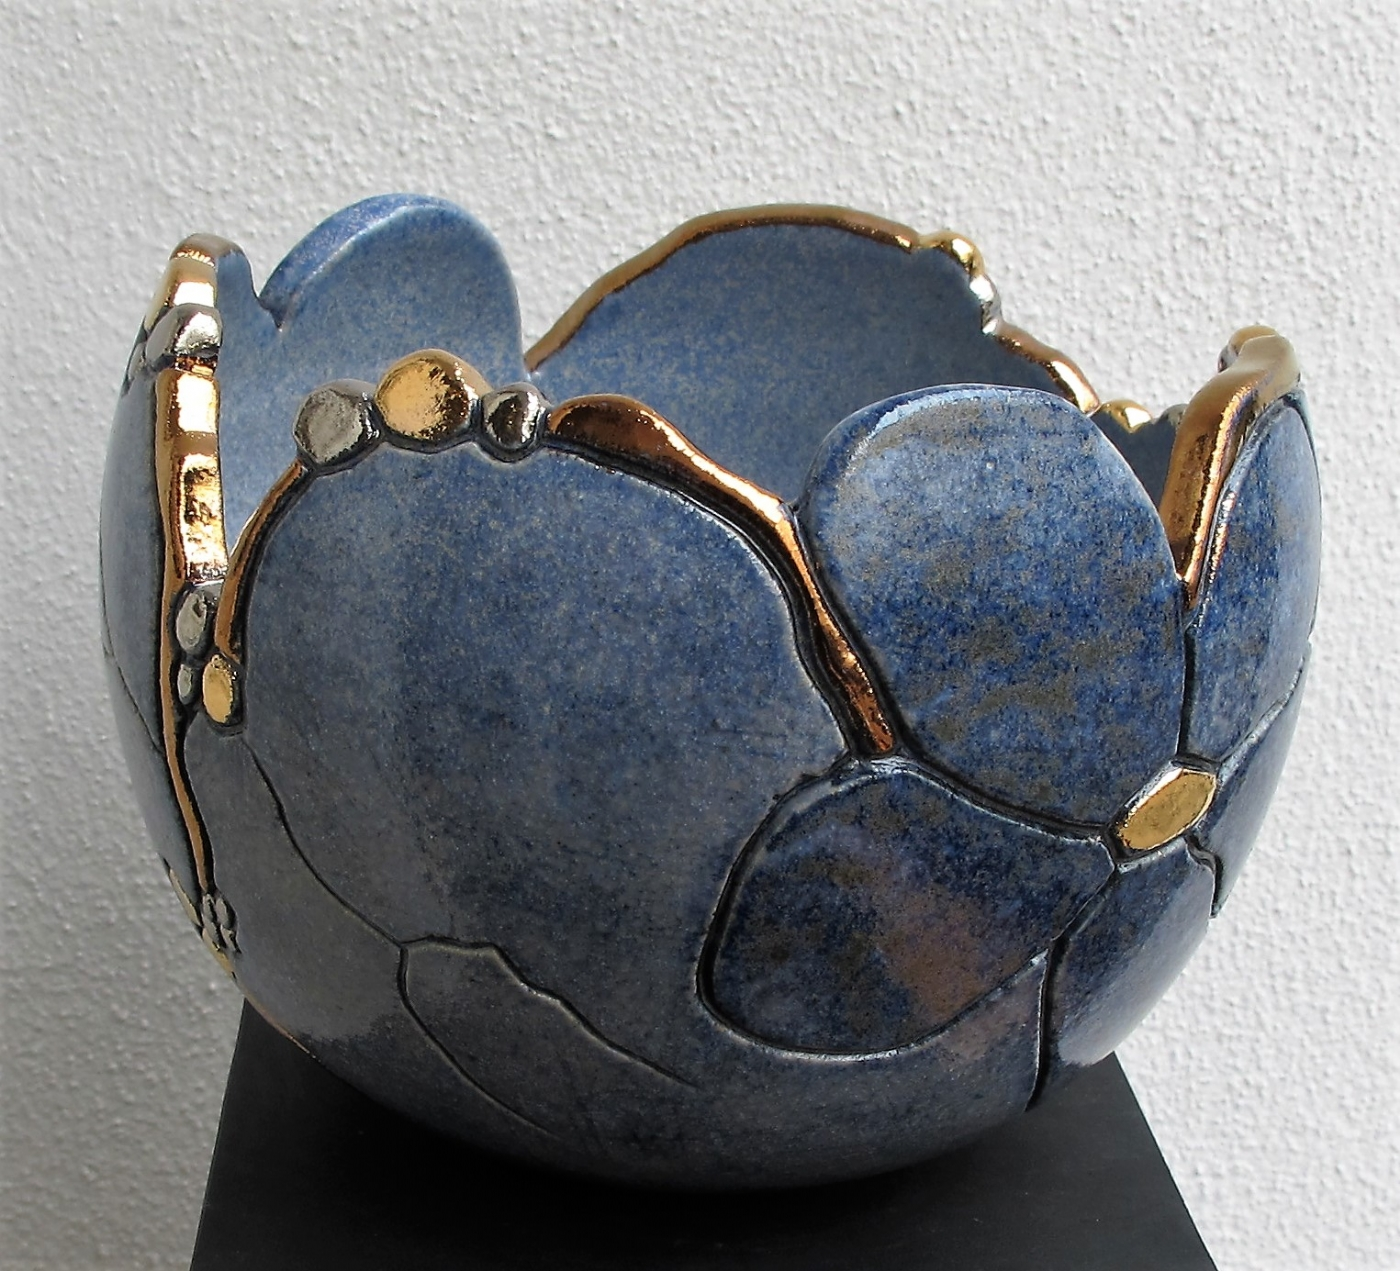 buttet krukke 2  m. blomst og metal | Keramik